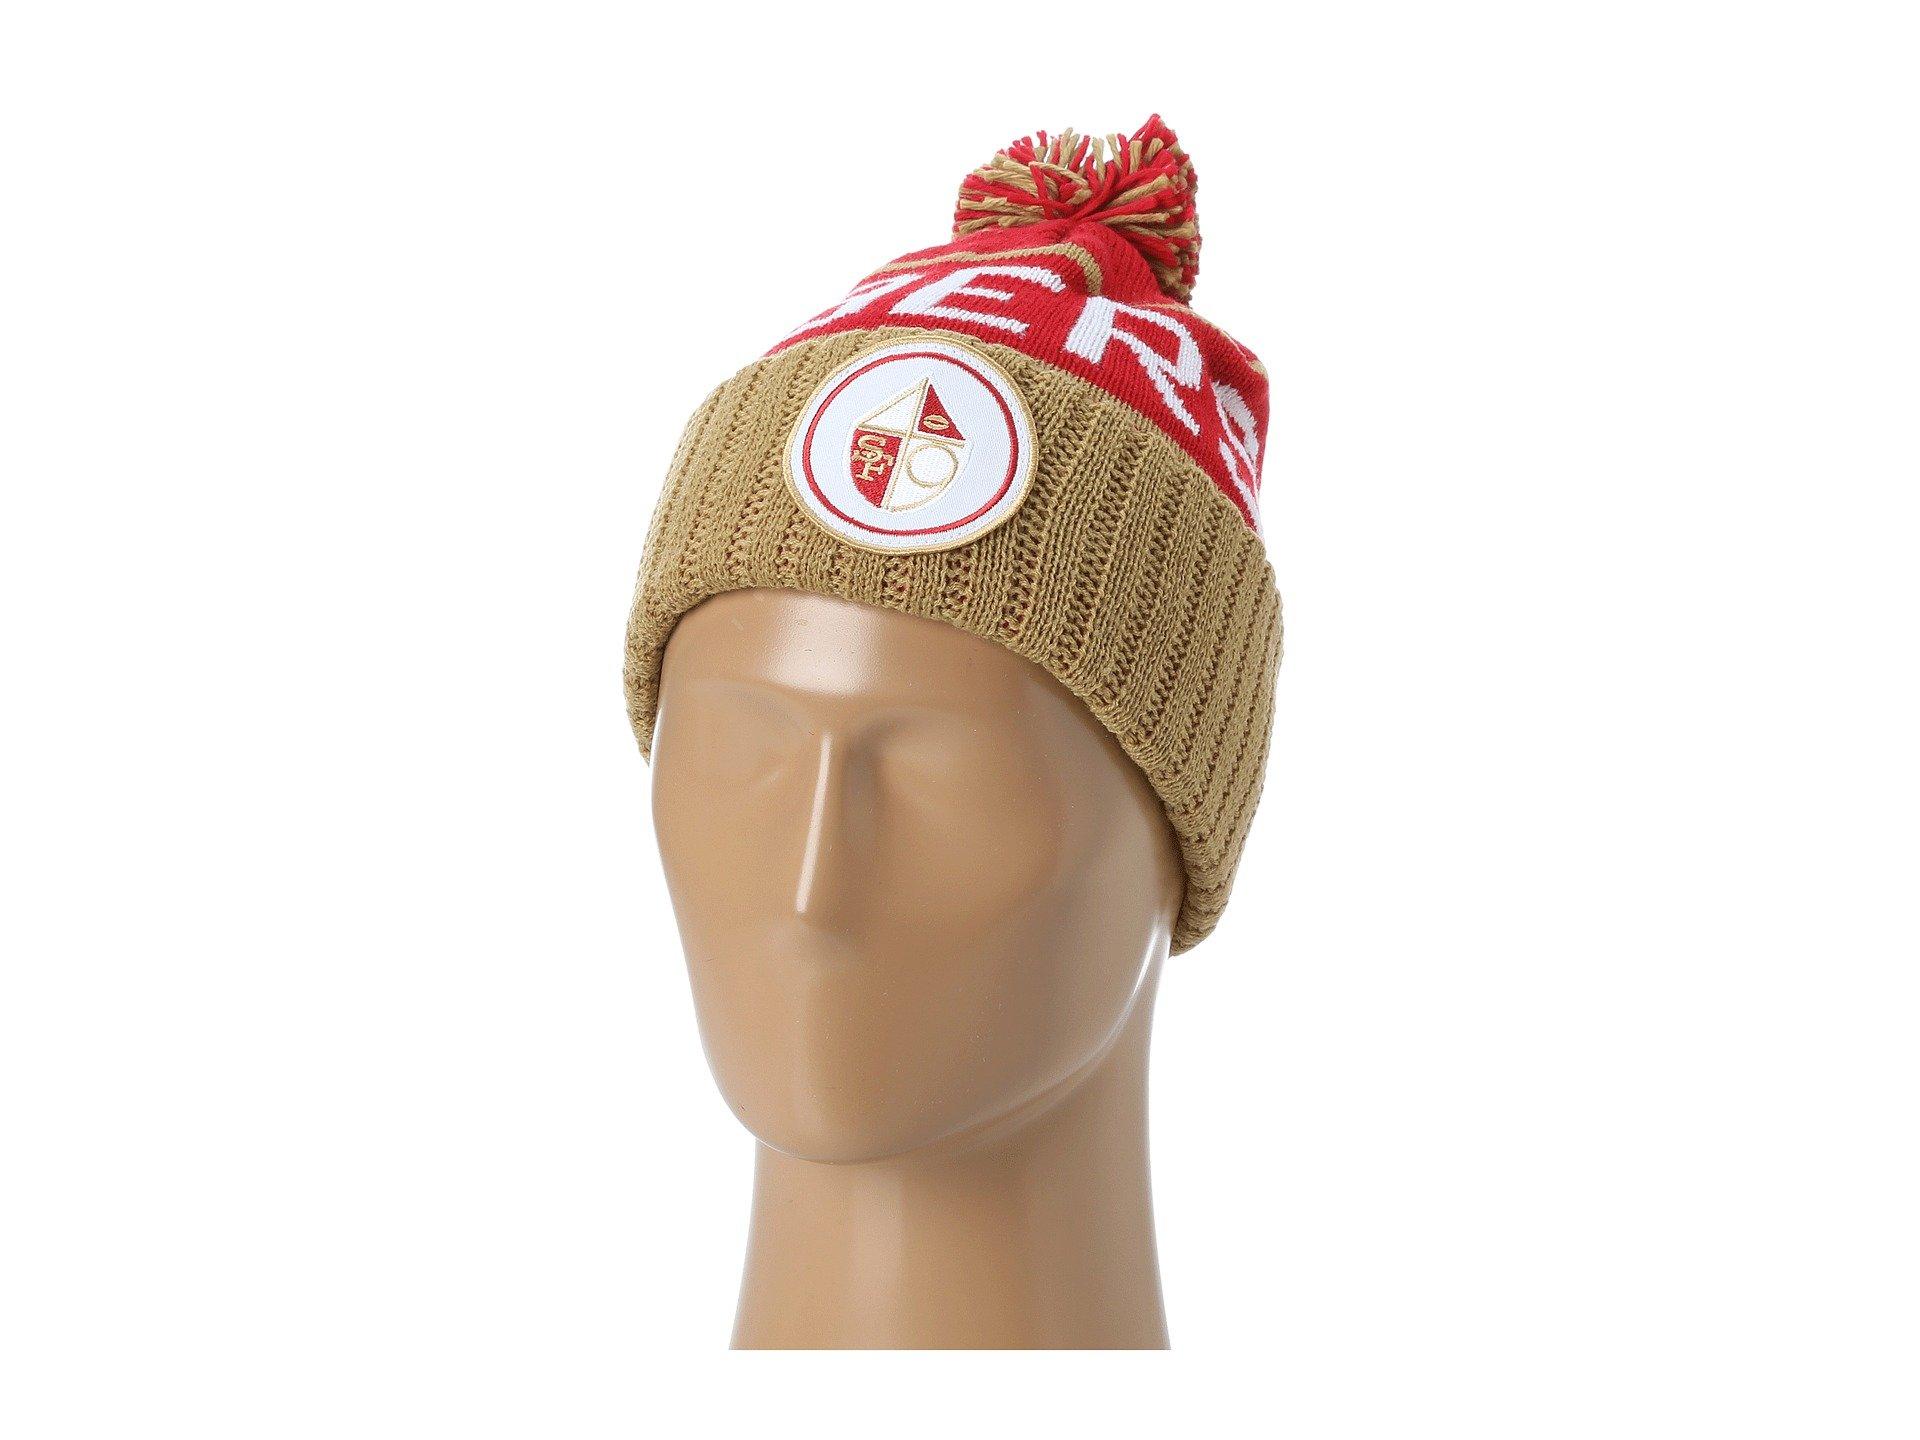 Mitchell & Ness San Francisco 49ers Vintage Cuffed Pom Knit Cap/Beanie by Mitchell & Ness